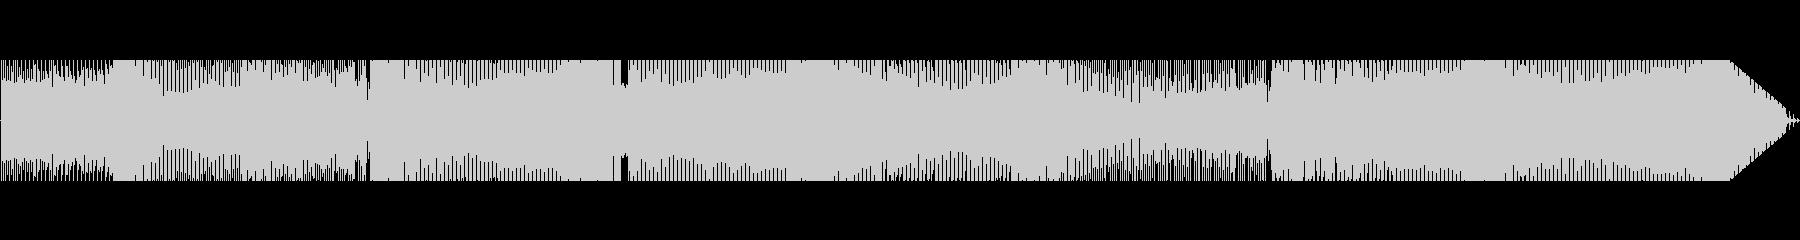 pop調で可愛らしいEDMの未再生の波形